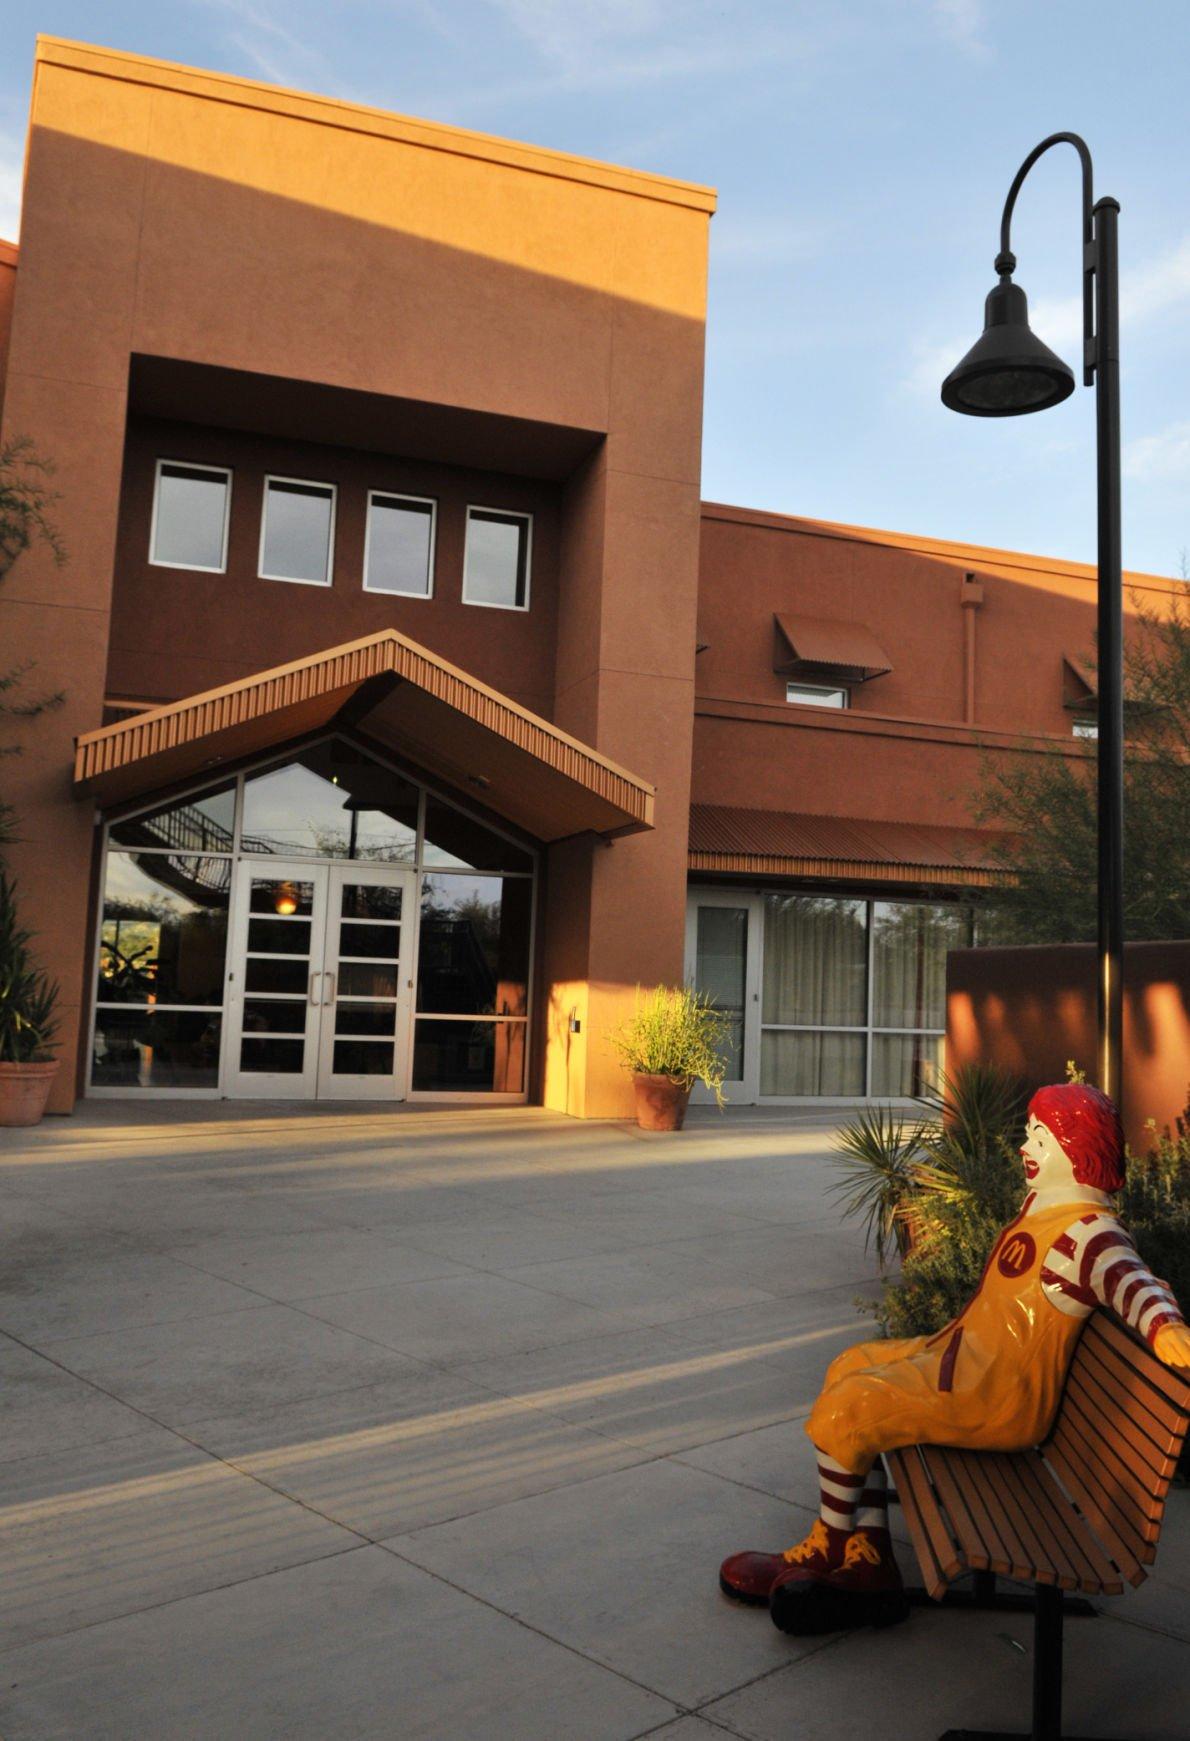 News 4 Tucson >> Ronald McDonald House having red shoe event | Local news | tucson.com